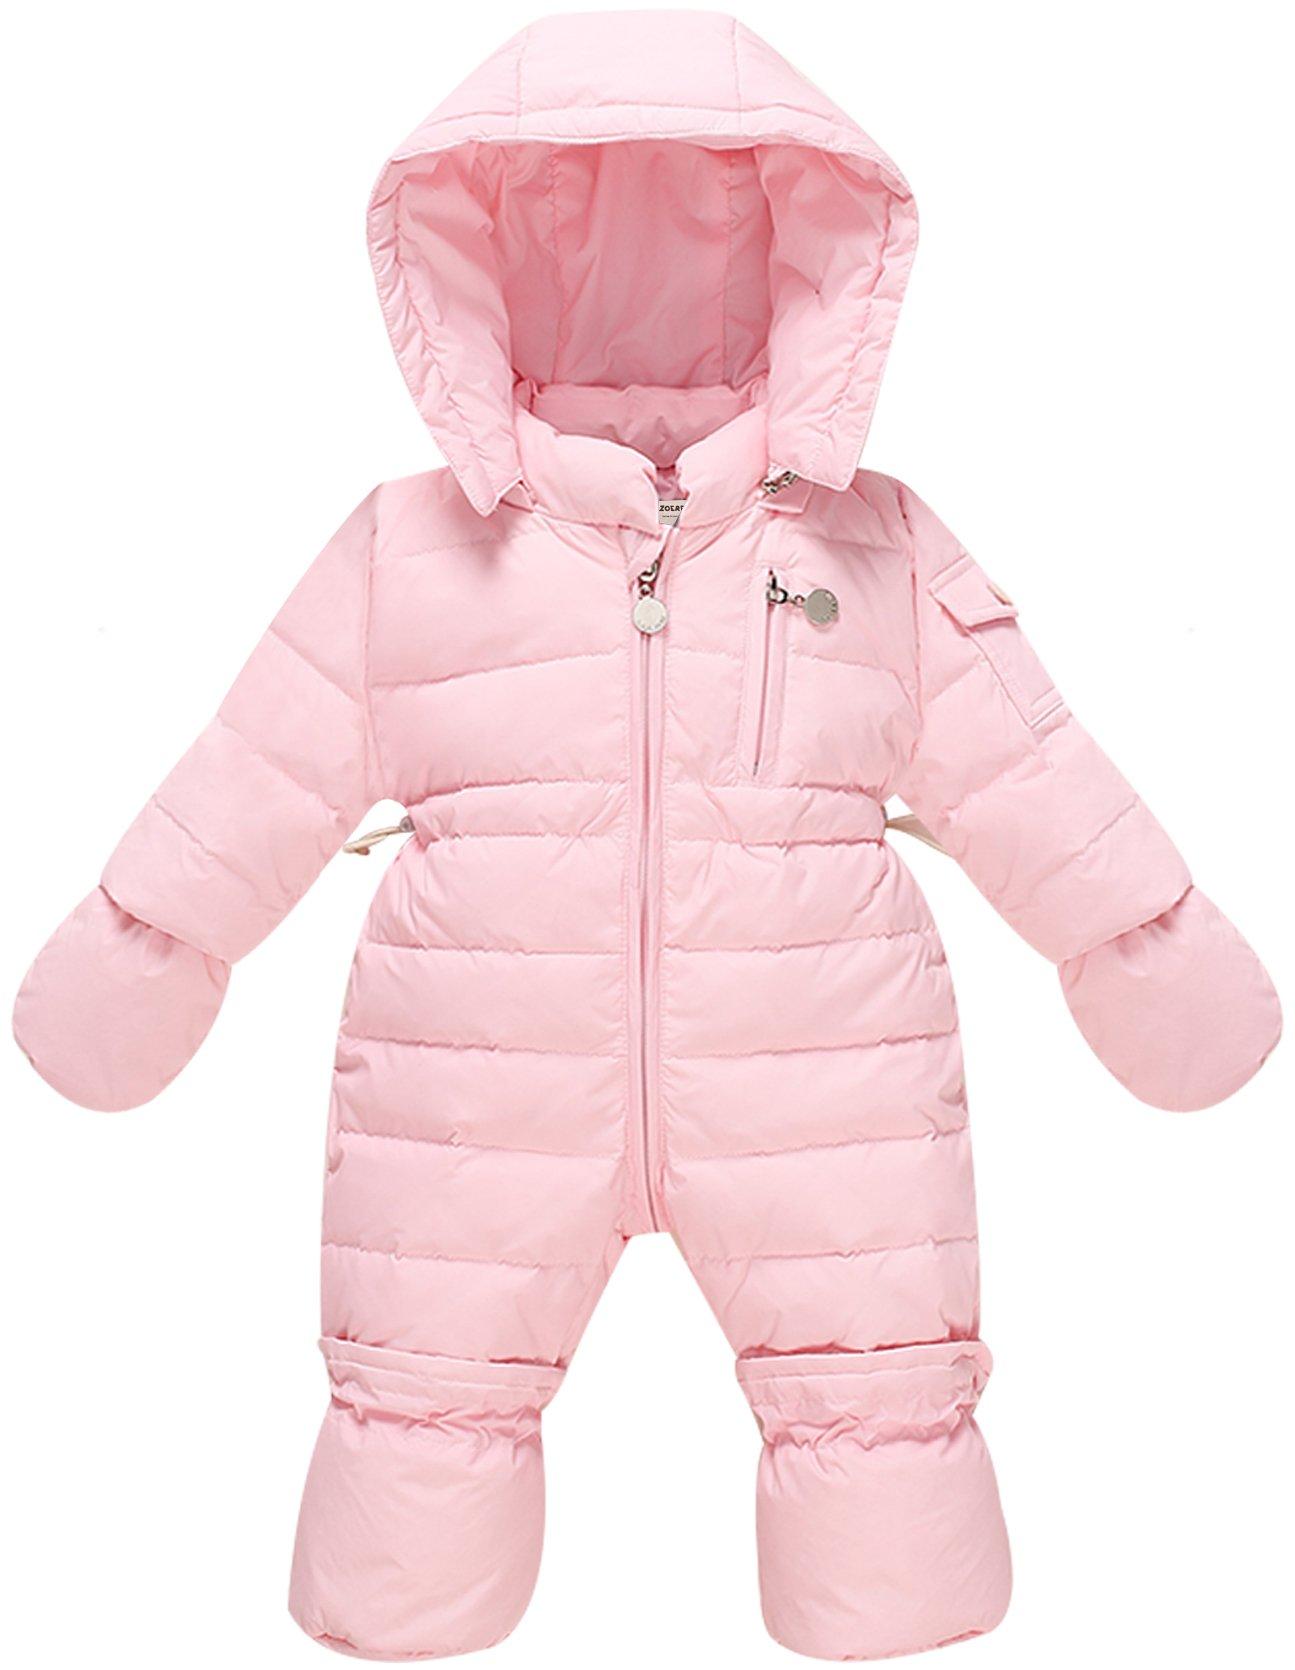 WESIDOM Newborn Baby Toddler Girls Boys Snowsuit Hooded Winter Romper Jumpsuit Coat Pink by WESIDOM